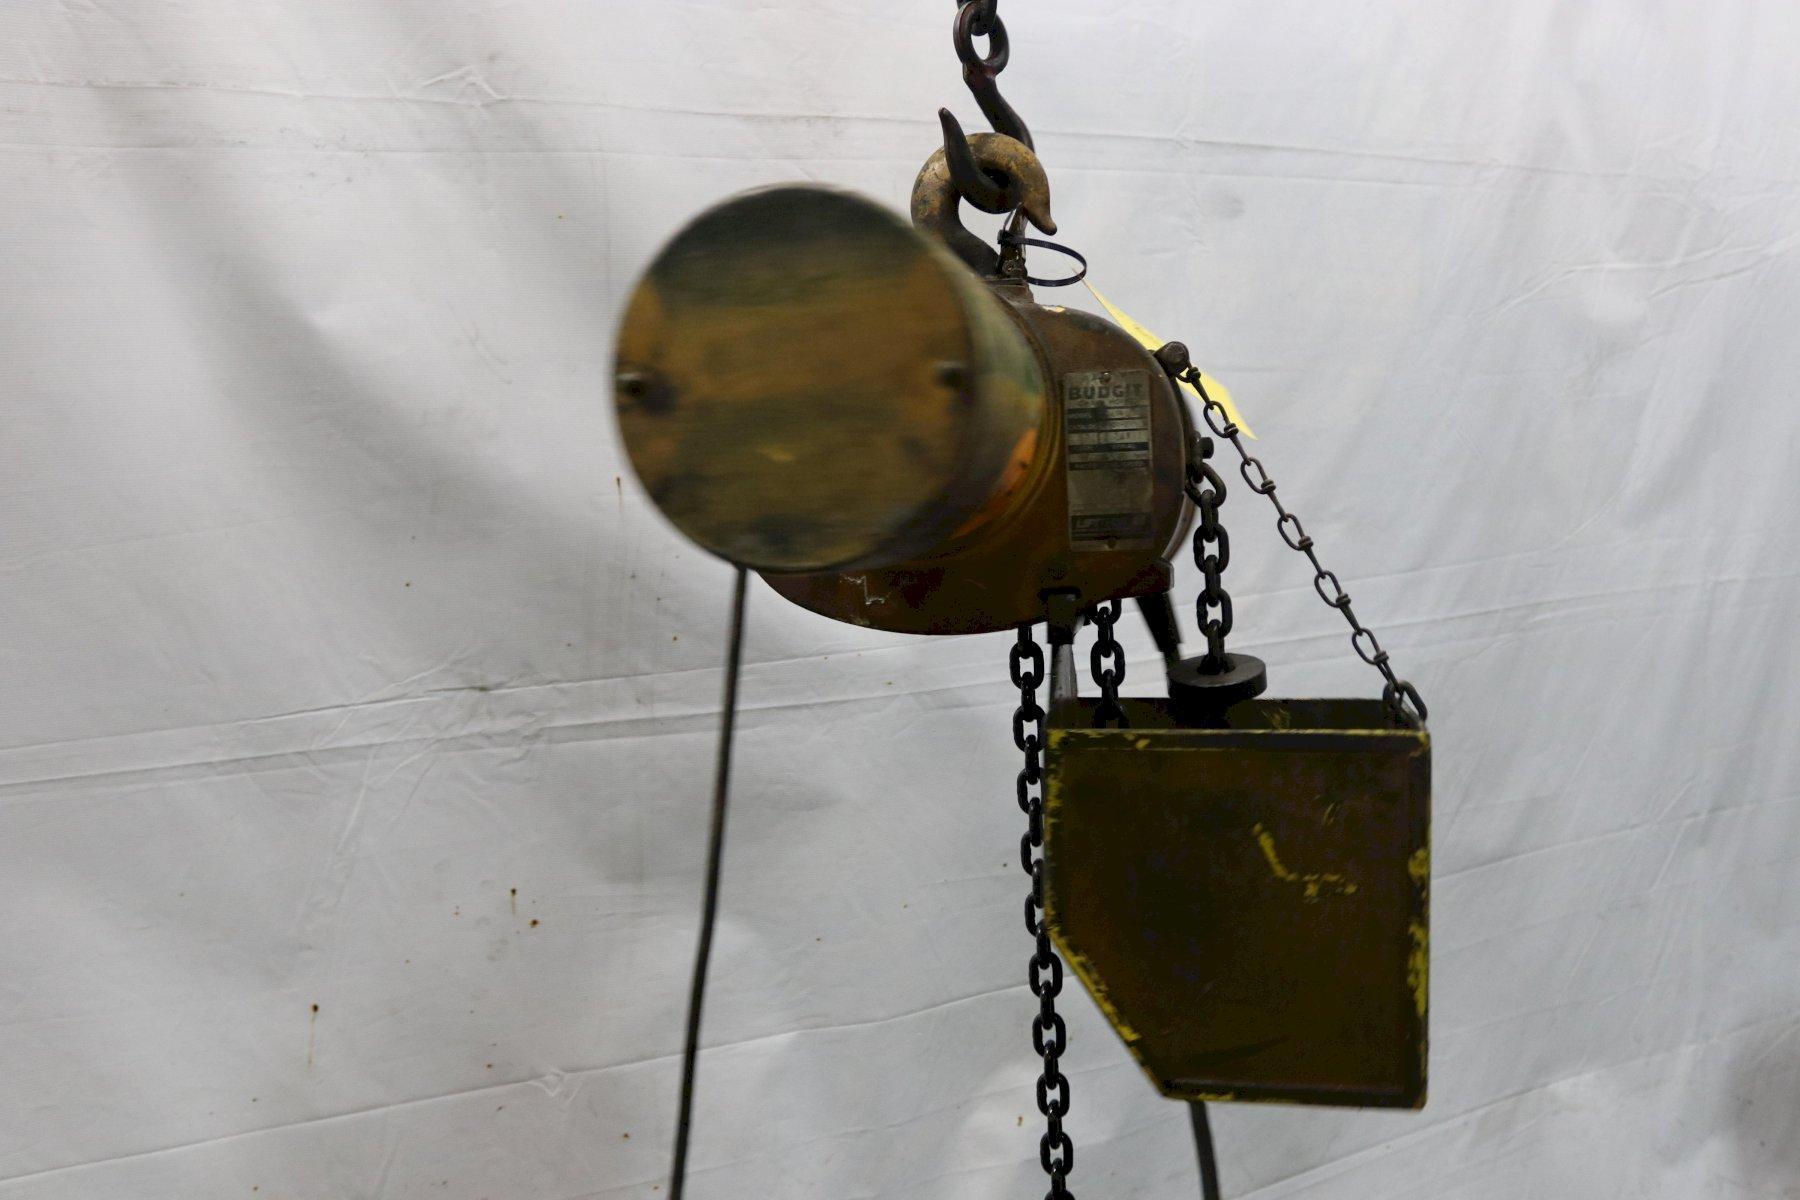 1/2 TON BUDGIT ELECTRIC POWERED CHAIN HOIST: STOCK #12005